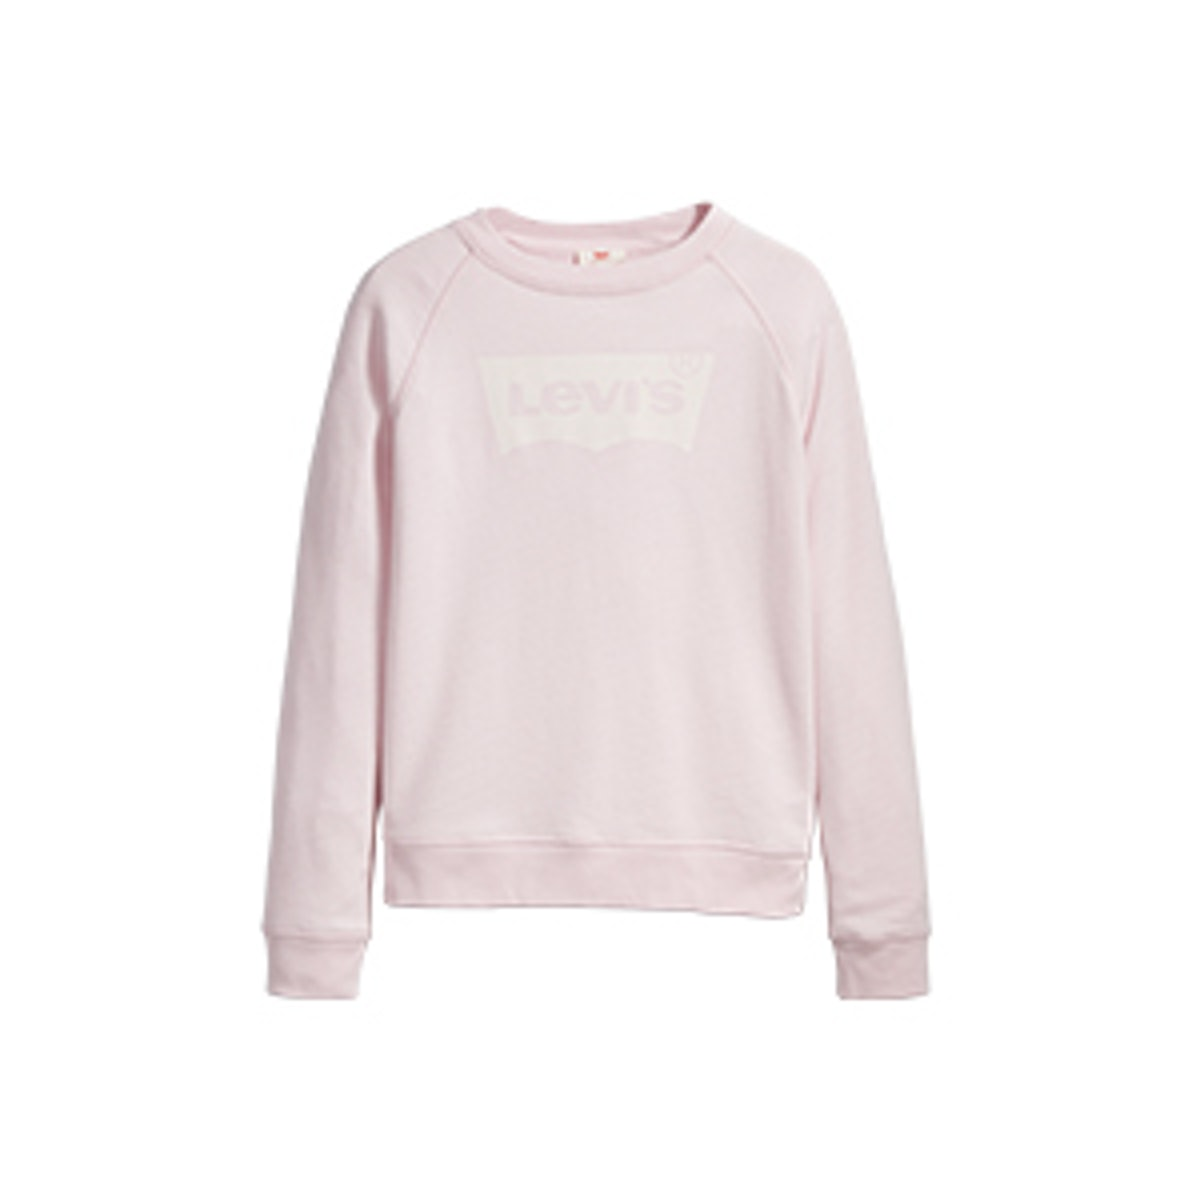 Classic Graphic Crewneck Sweatshirt